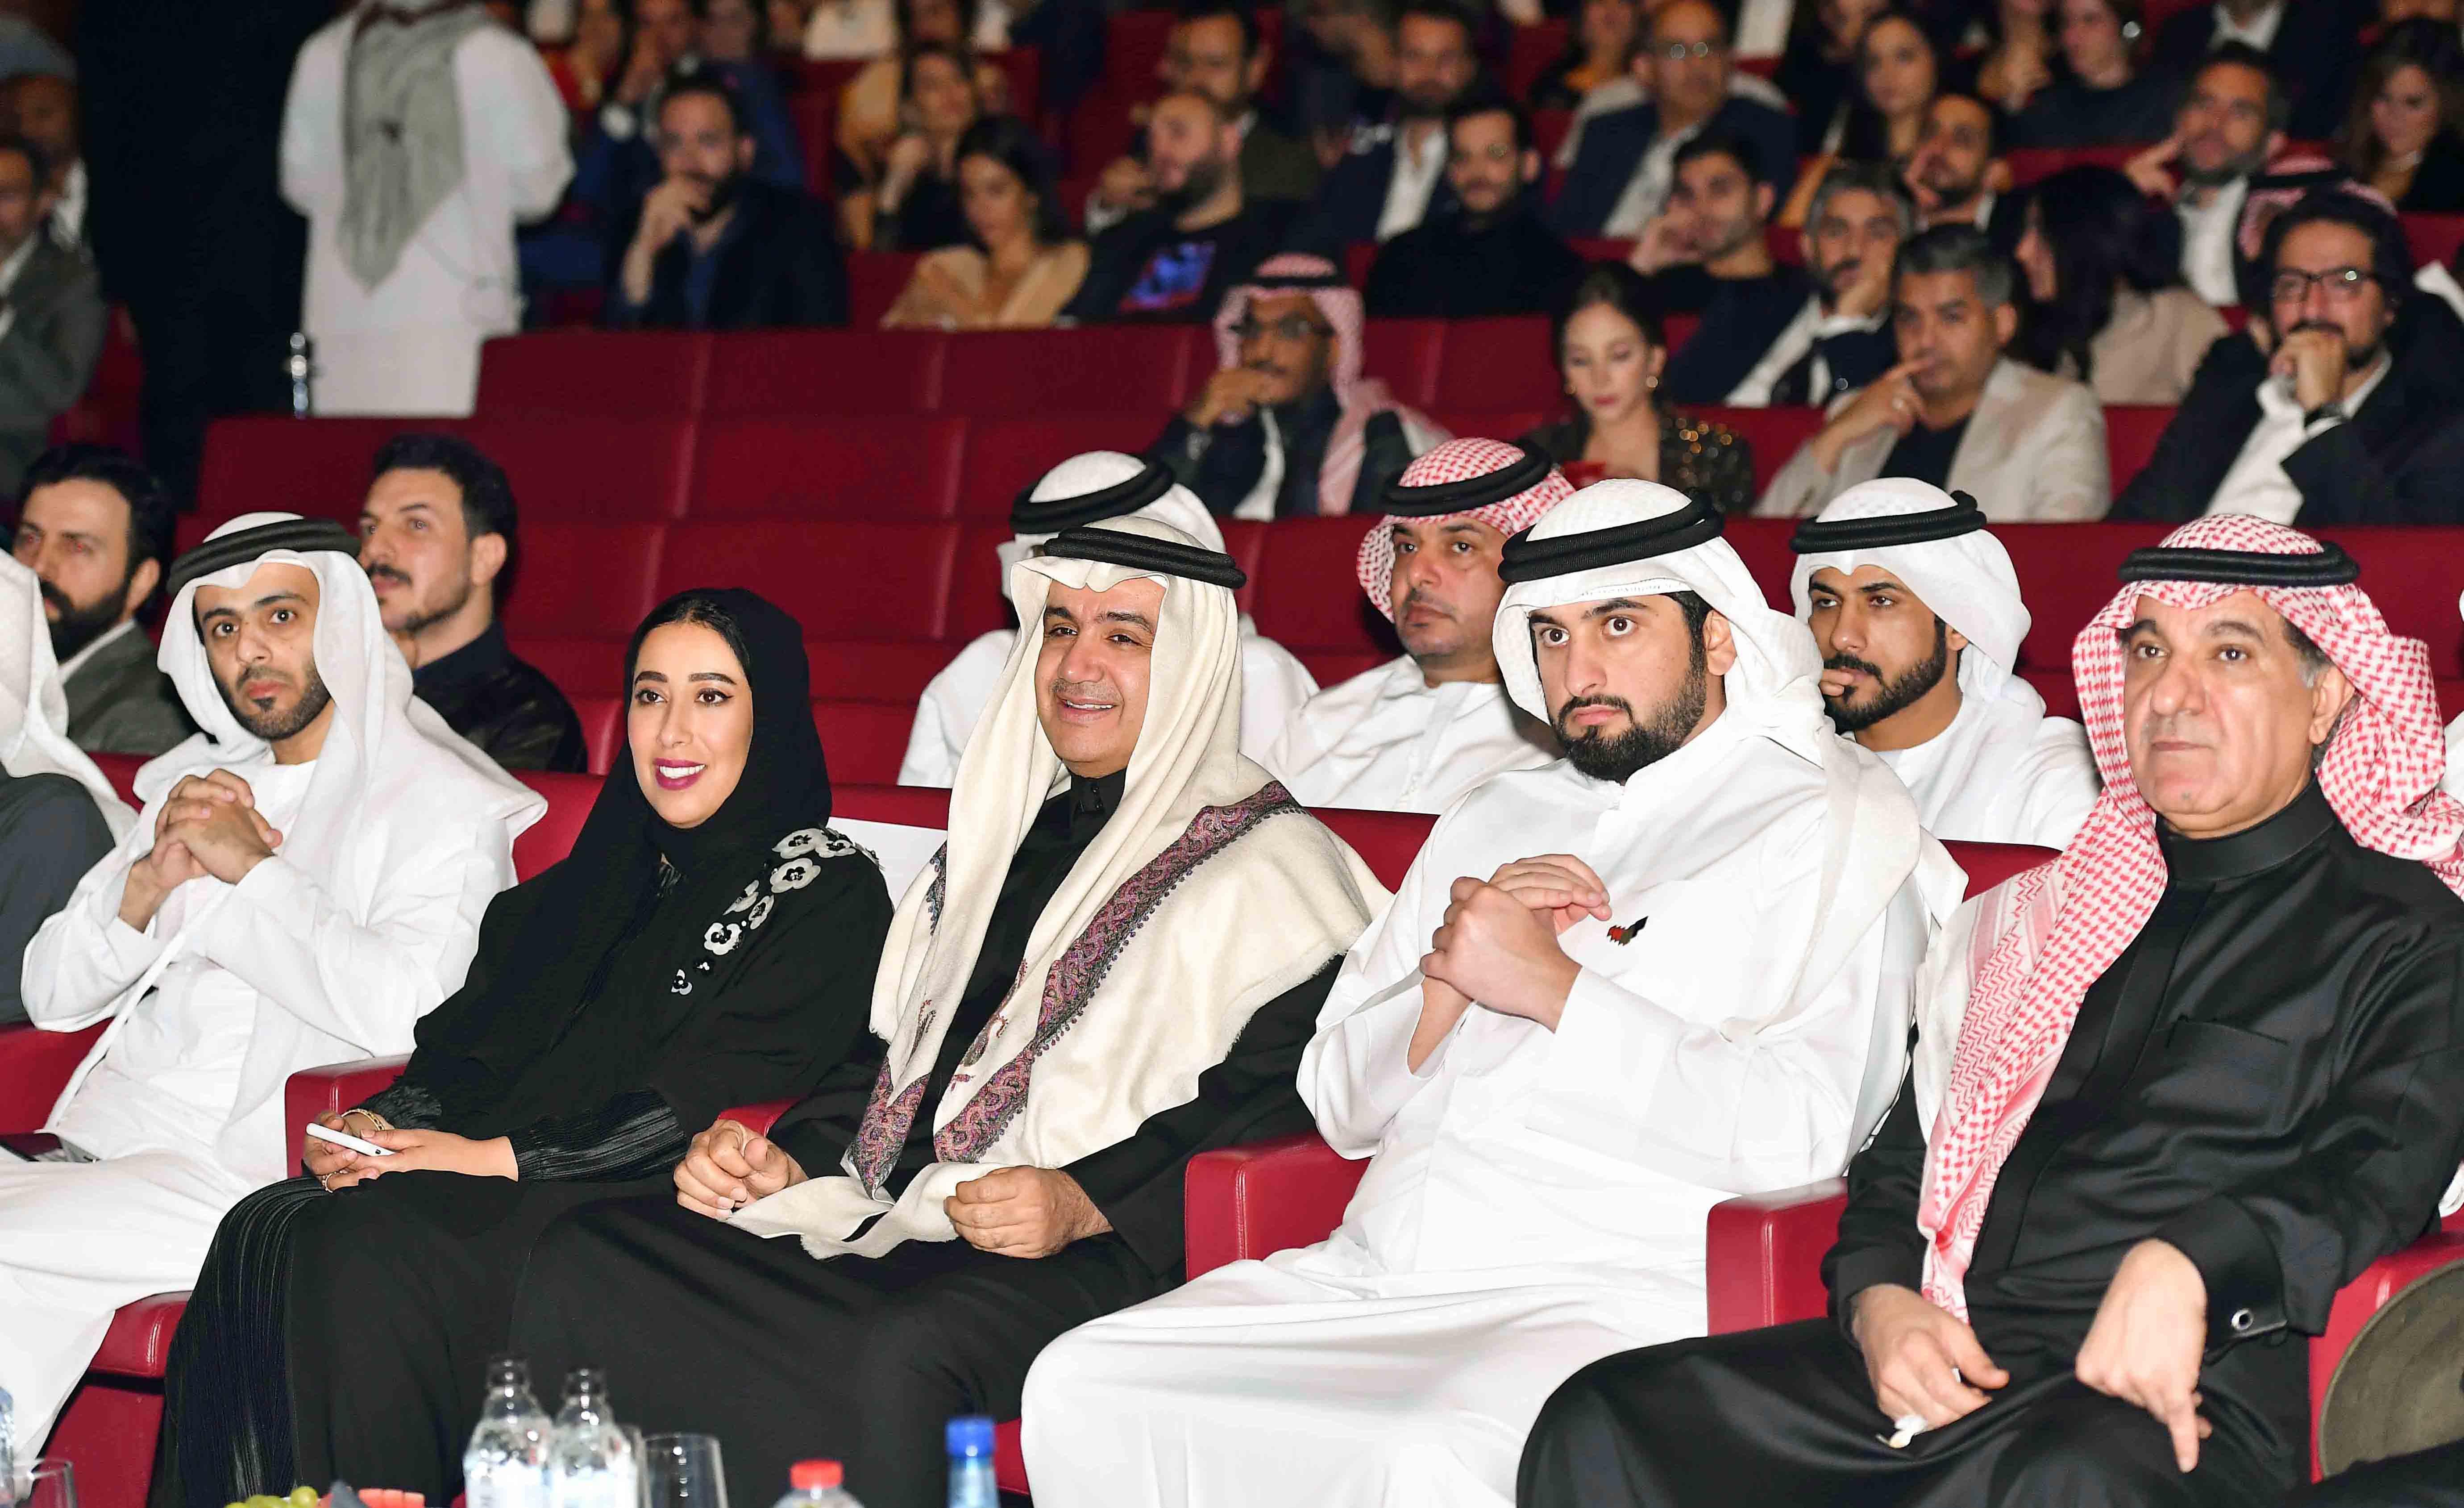 Shahid re-launch event - HH Sheikh Ahmad Bin Mohammed Bin Rashid Al Maktoum & Sheikh Walid Al Ibrahim, Turki Shabana & Mona Al Marri